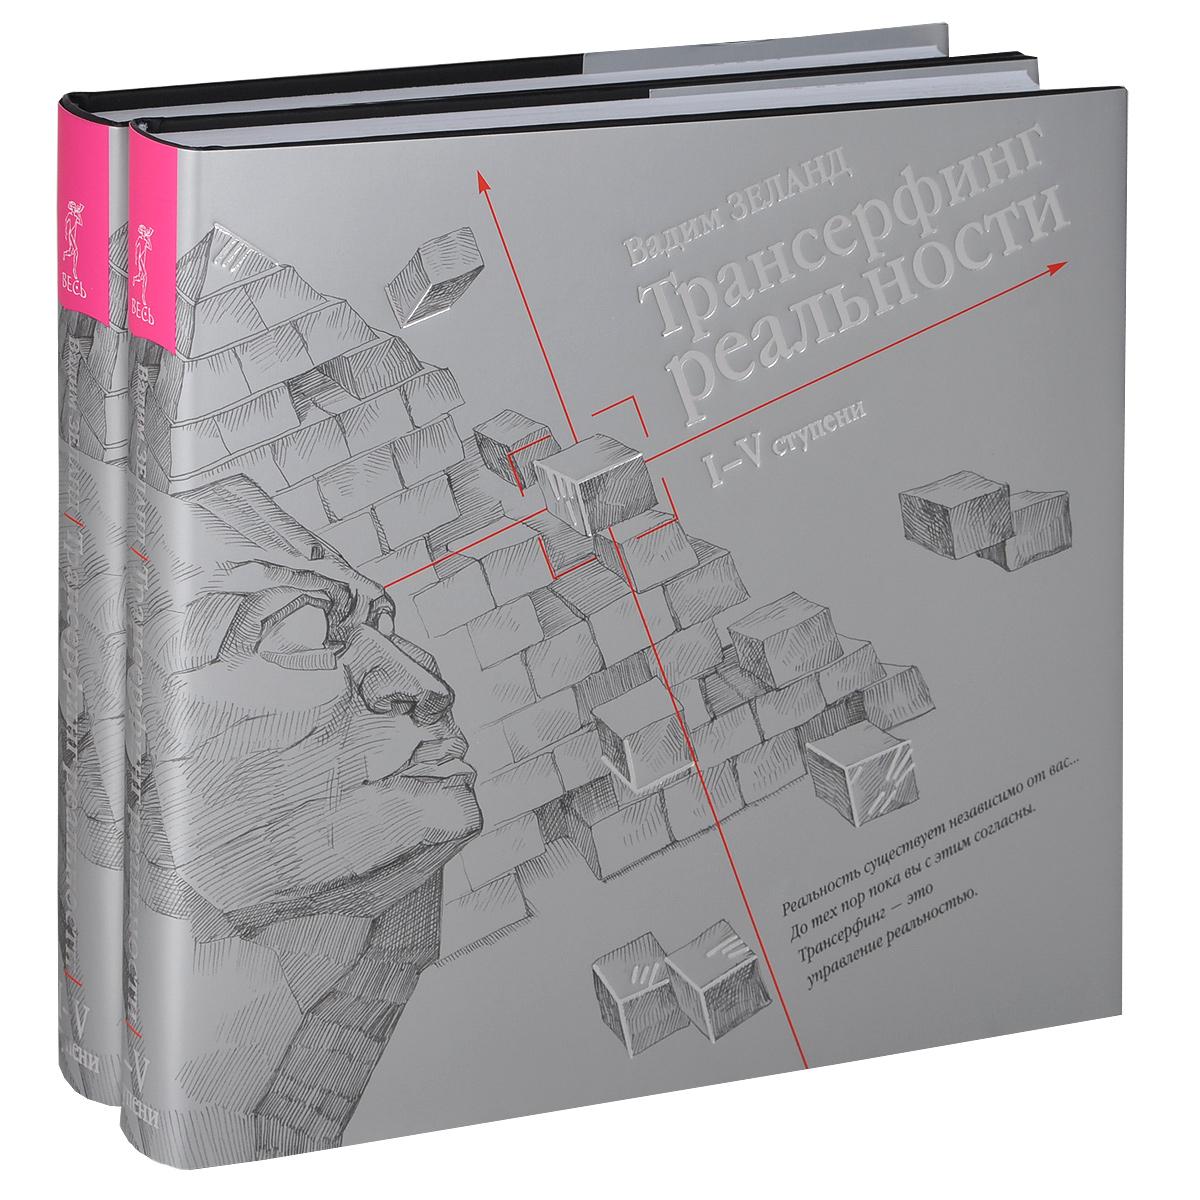 Трансерфинг реальности. 1-5 ступени (комплект из 2 книг). Вадим Зеланд